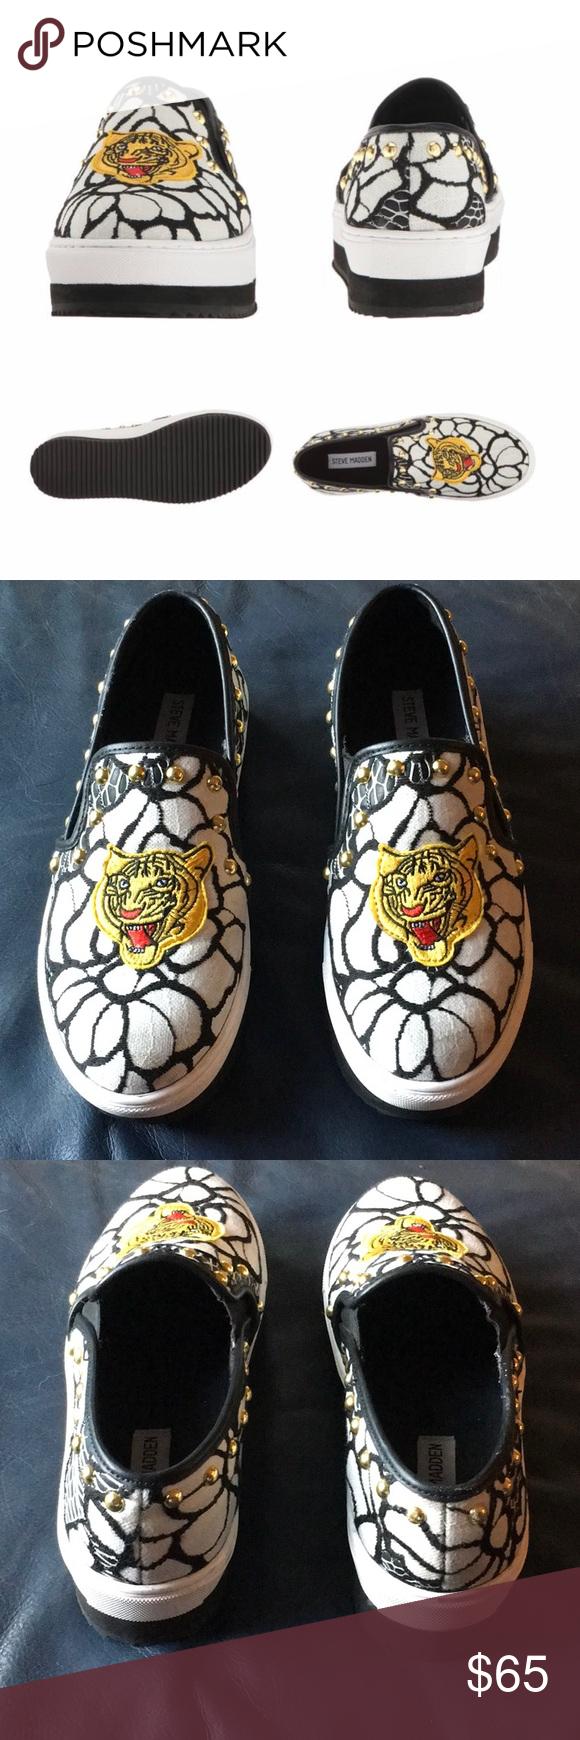 Steve Madden Slick-P Tiger Sneaker Slip